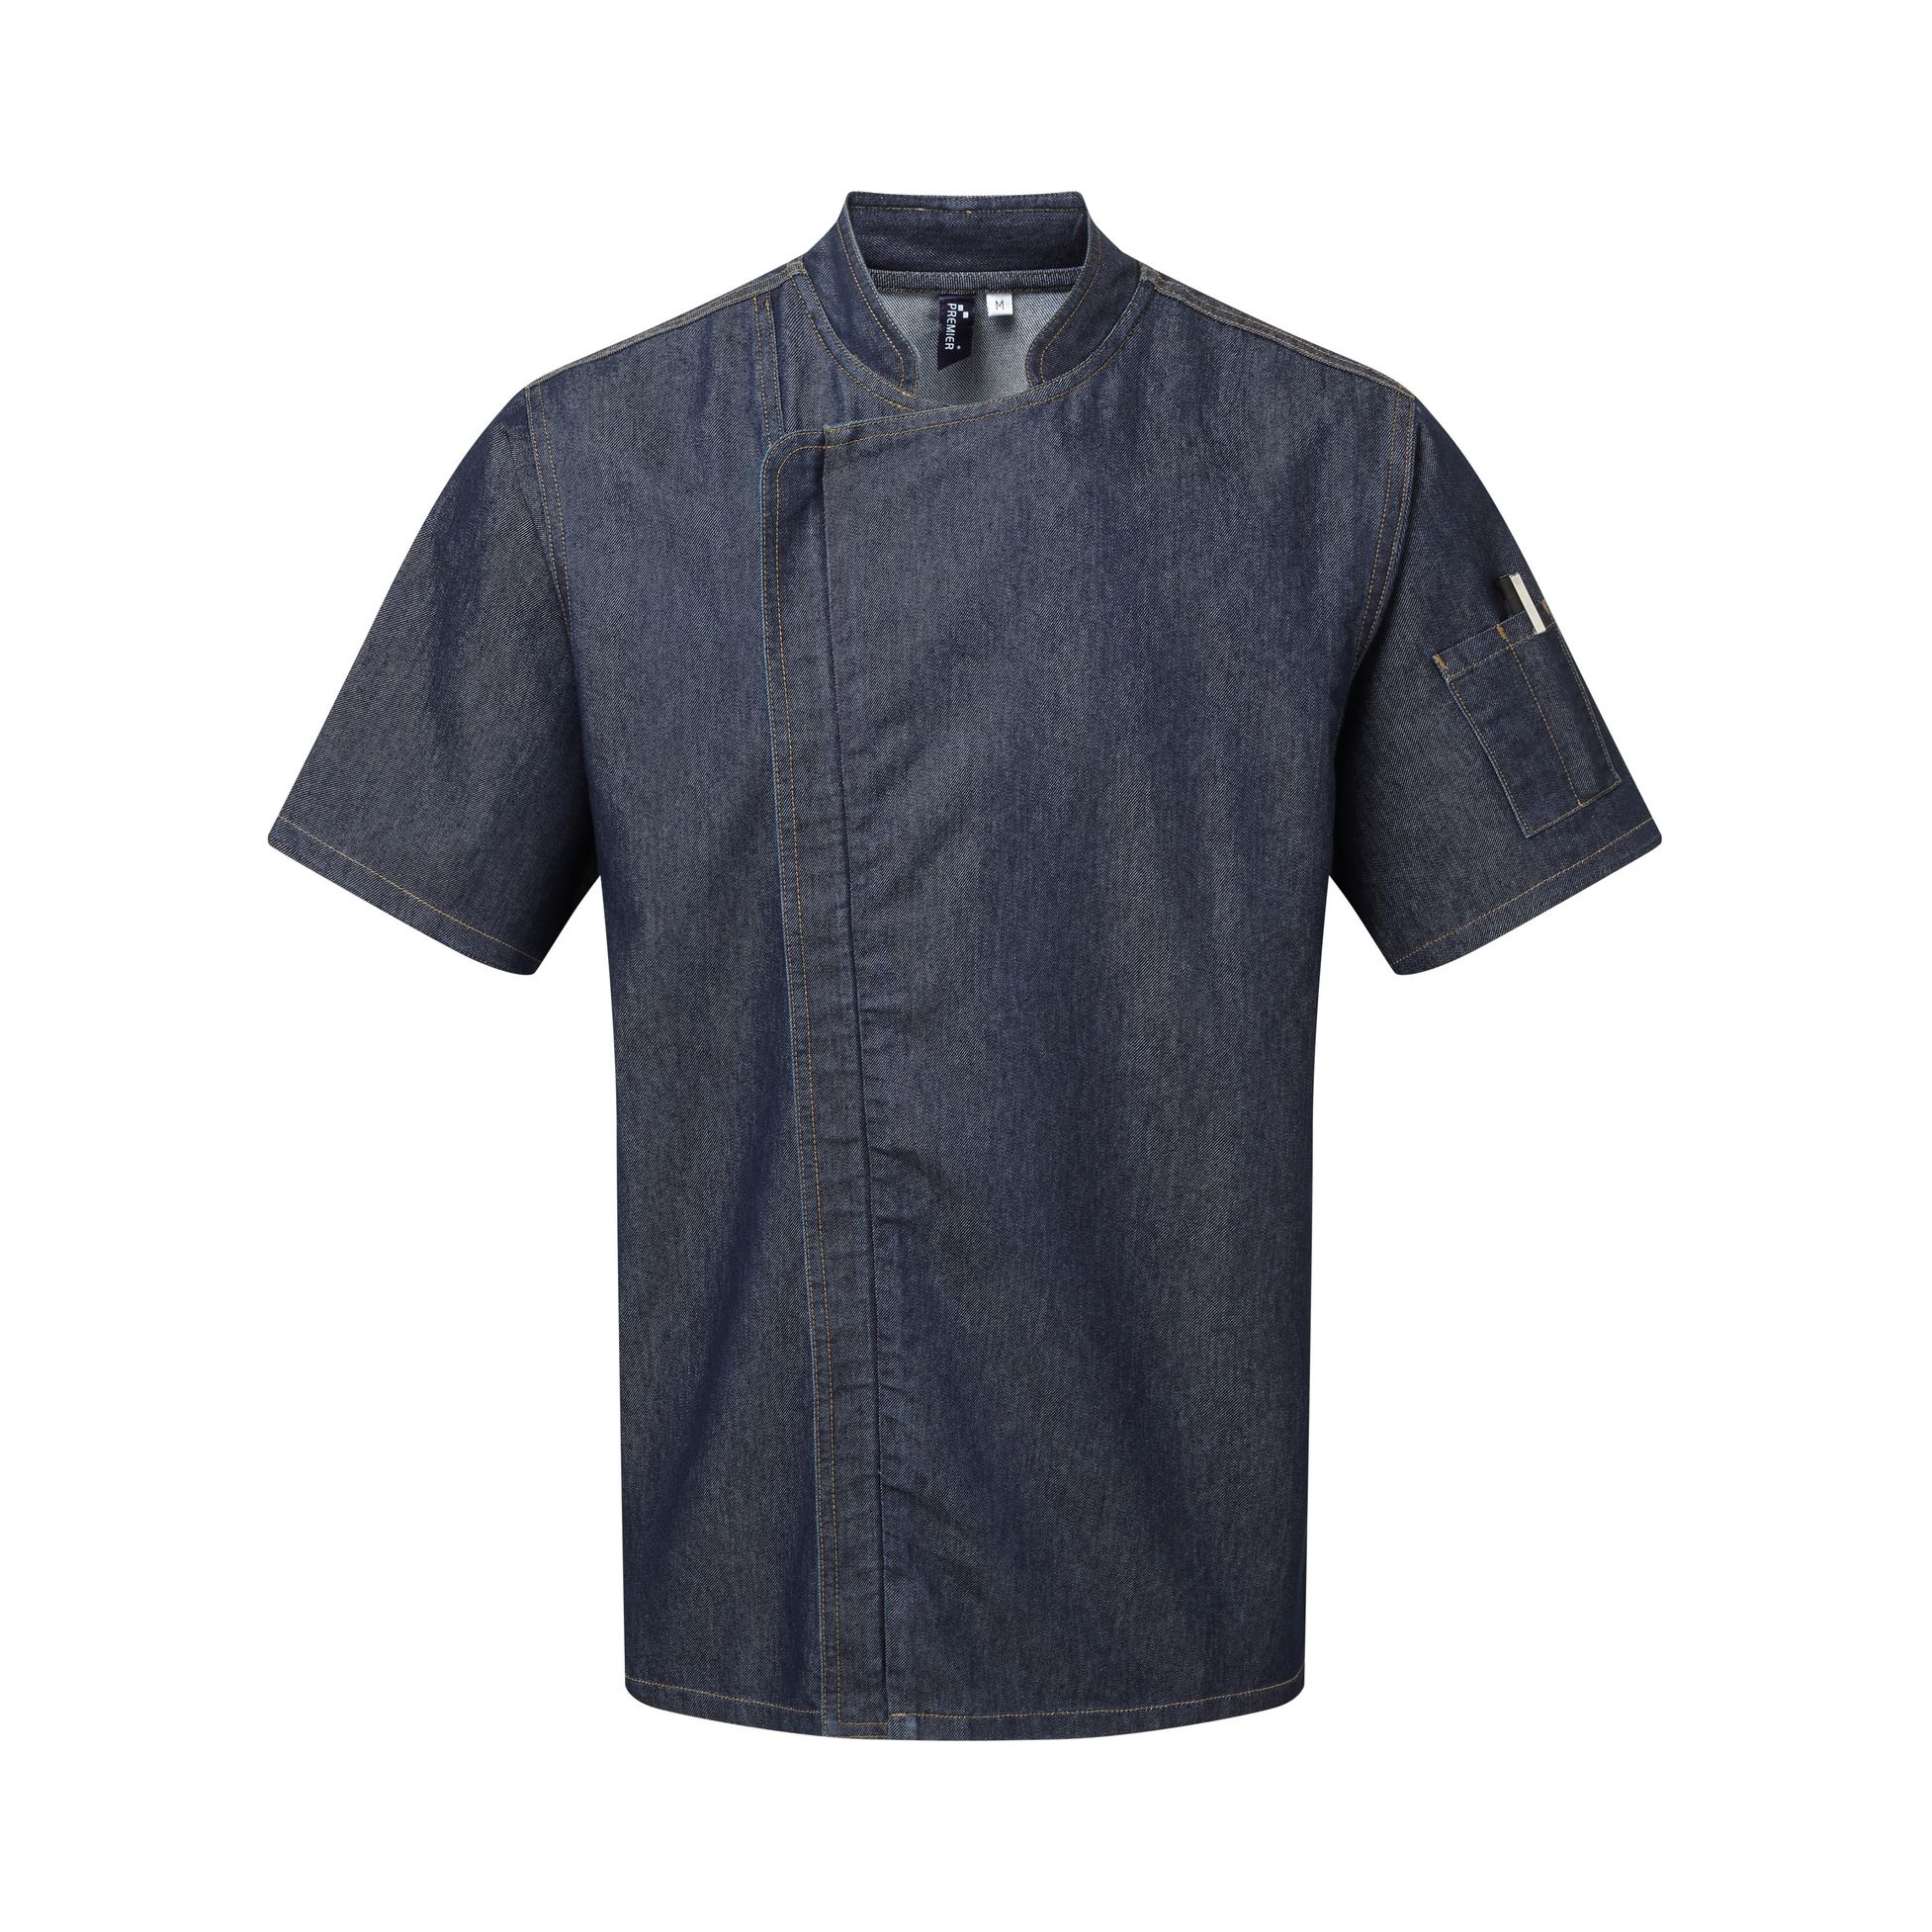 Premier Unisex Adults Chefs Zip-Close Short Sleeve Jacket (XL) (Indigo Denim)